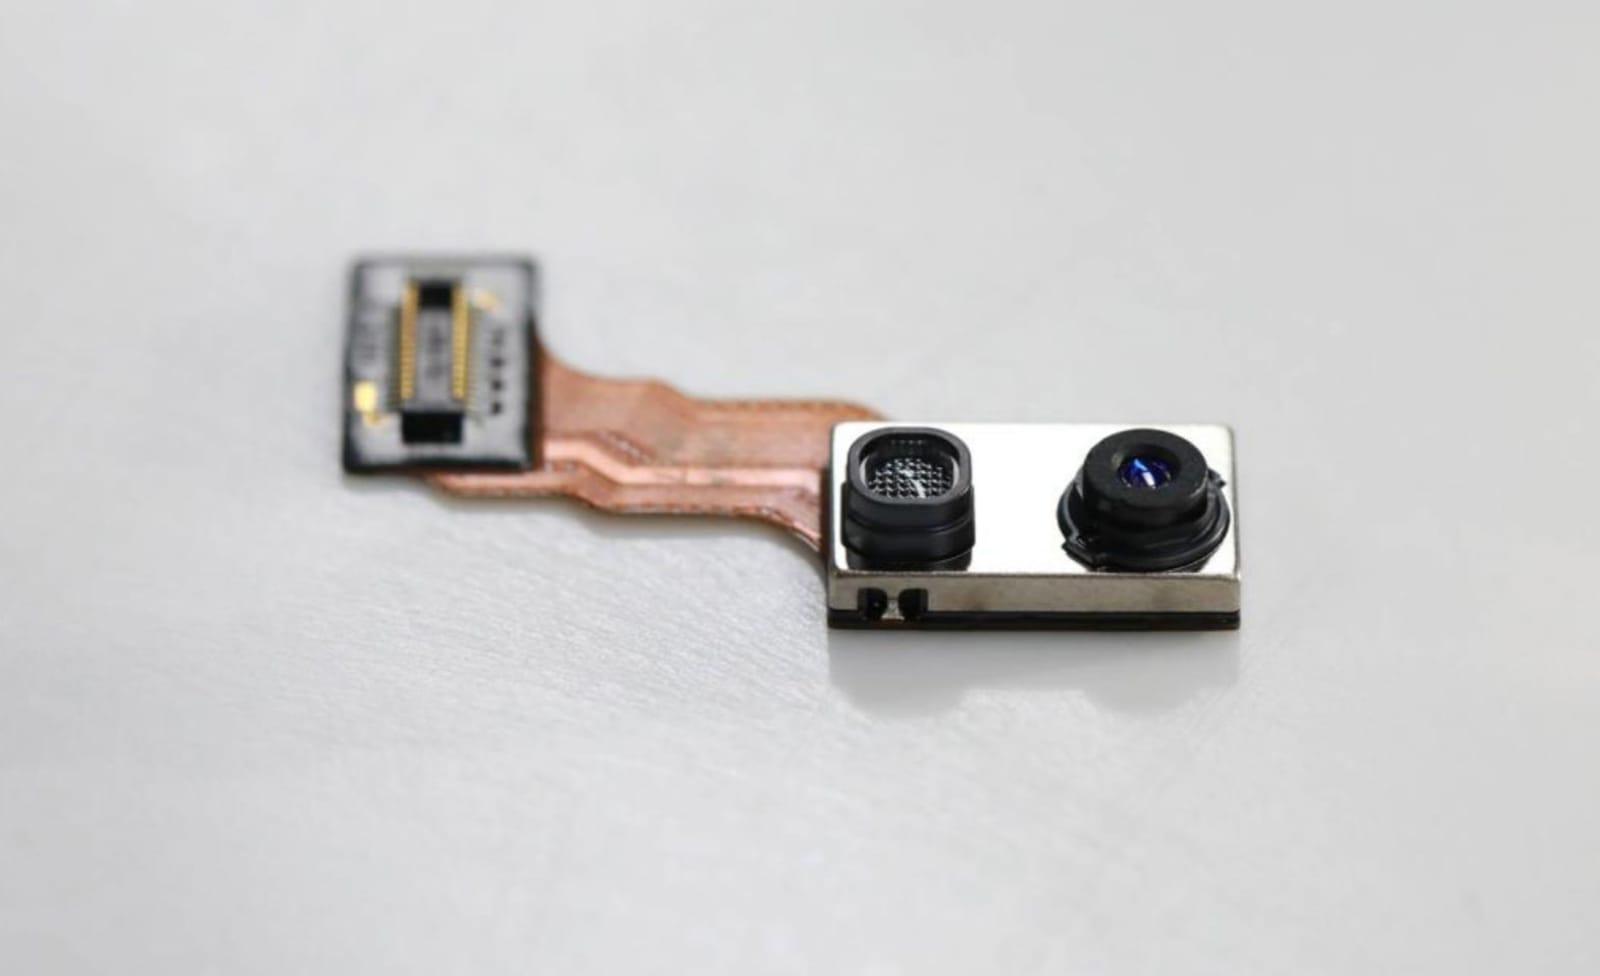 LG explains how the G8 ThinQ's tiny gesture sensor works